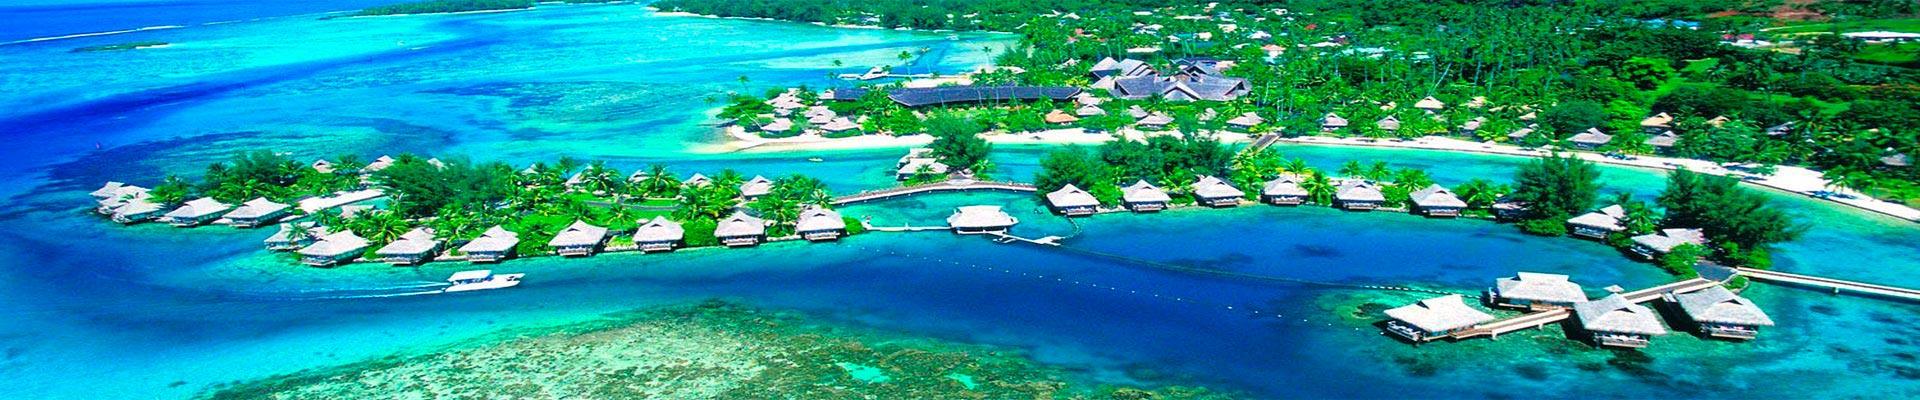 Papeete, Moorea e Bora Bora